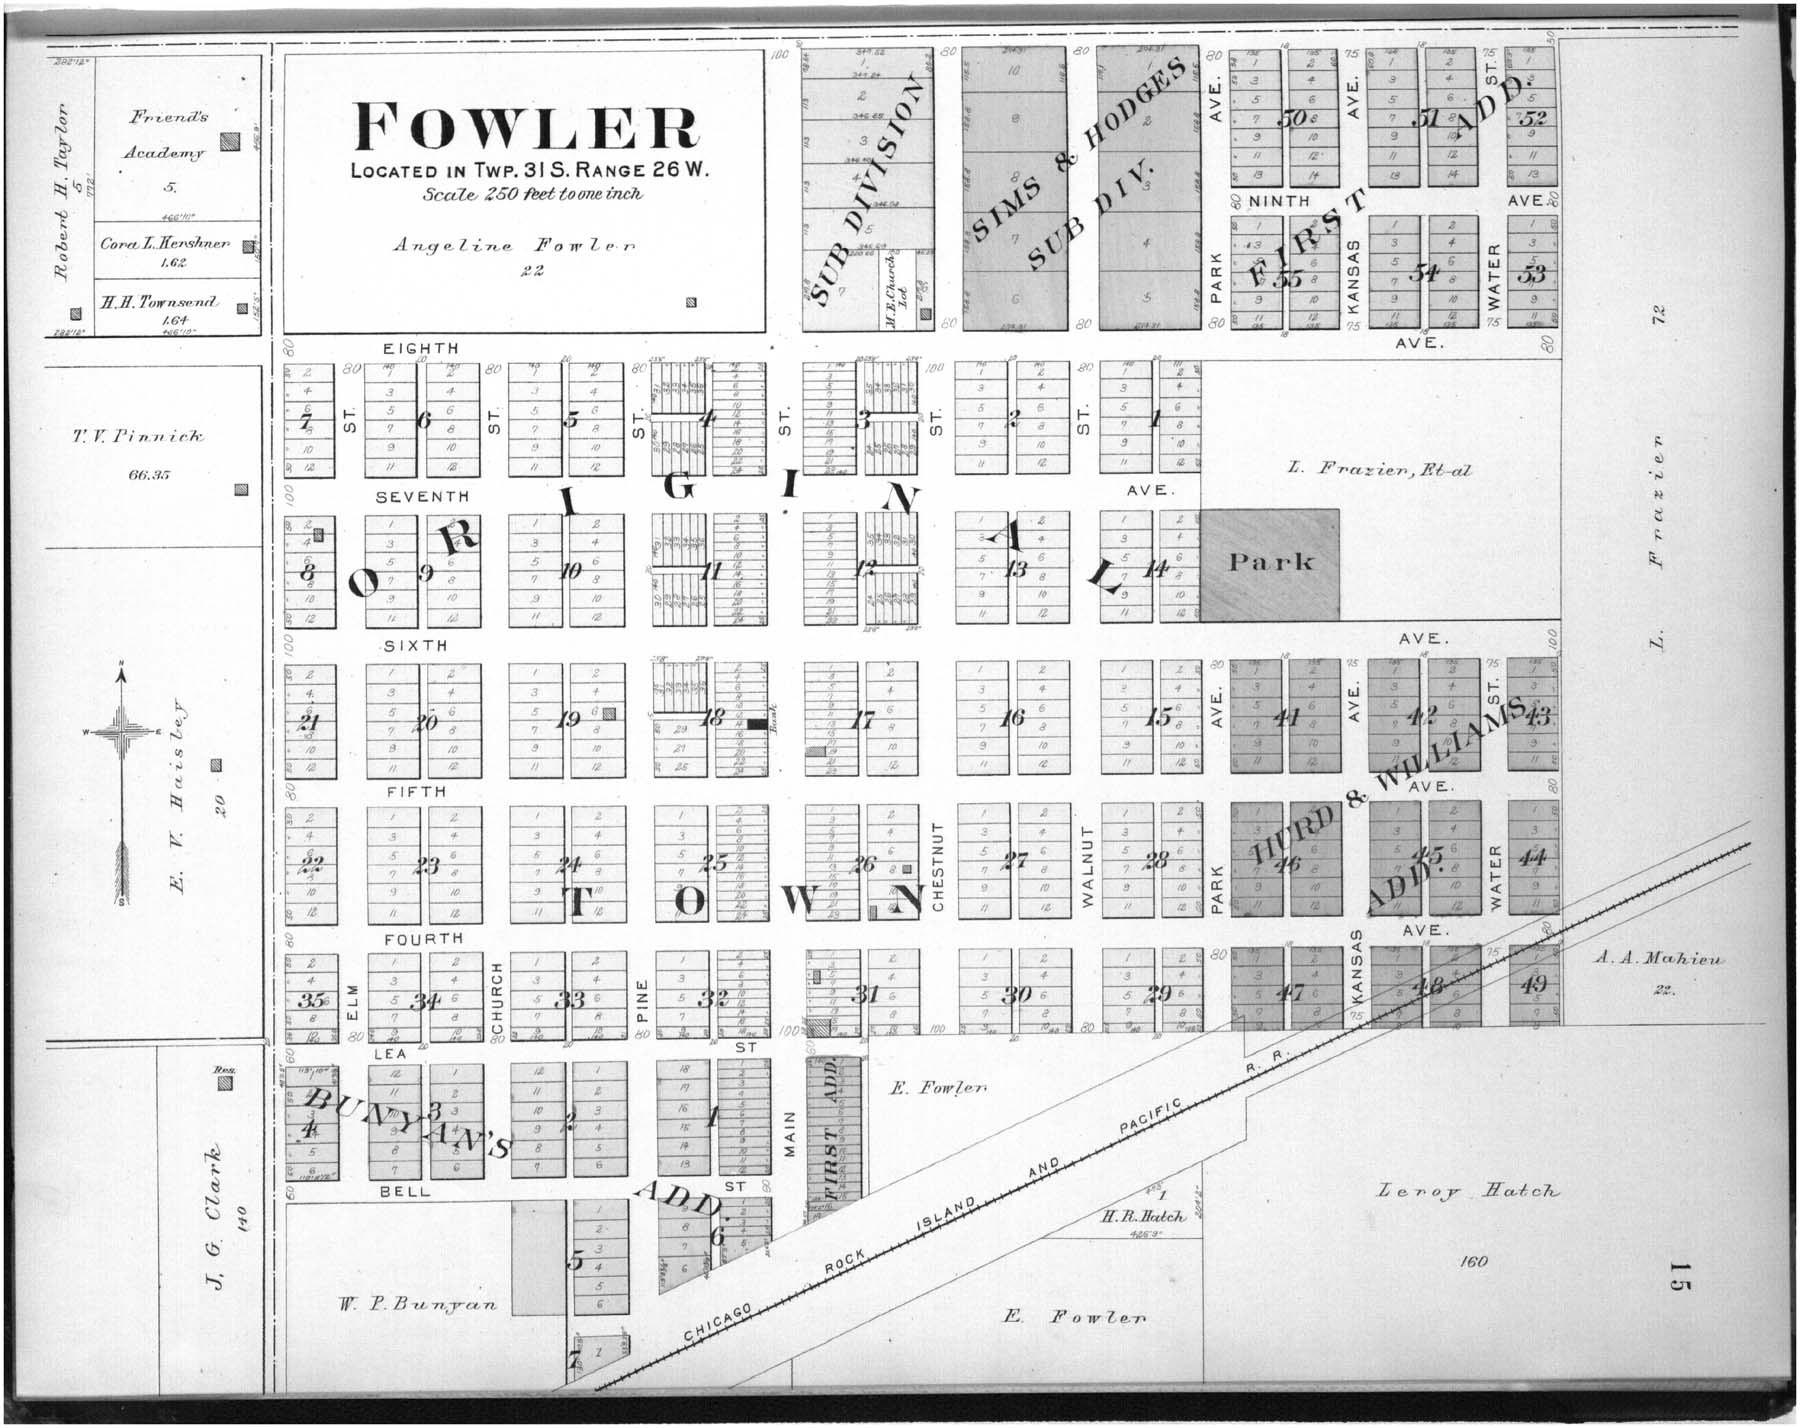 Plat book of Meade County, Kansas - 15